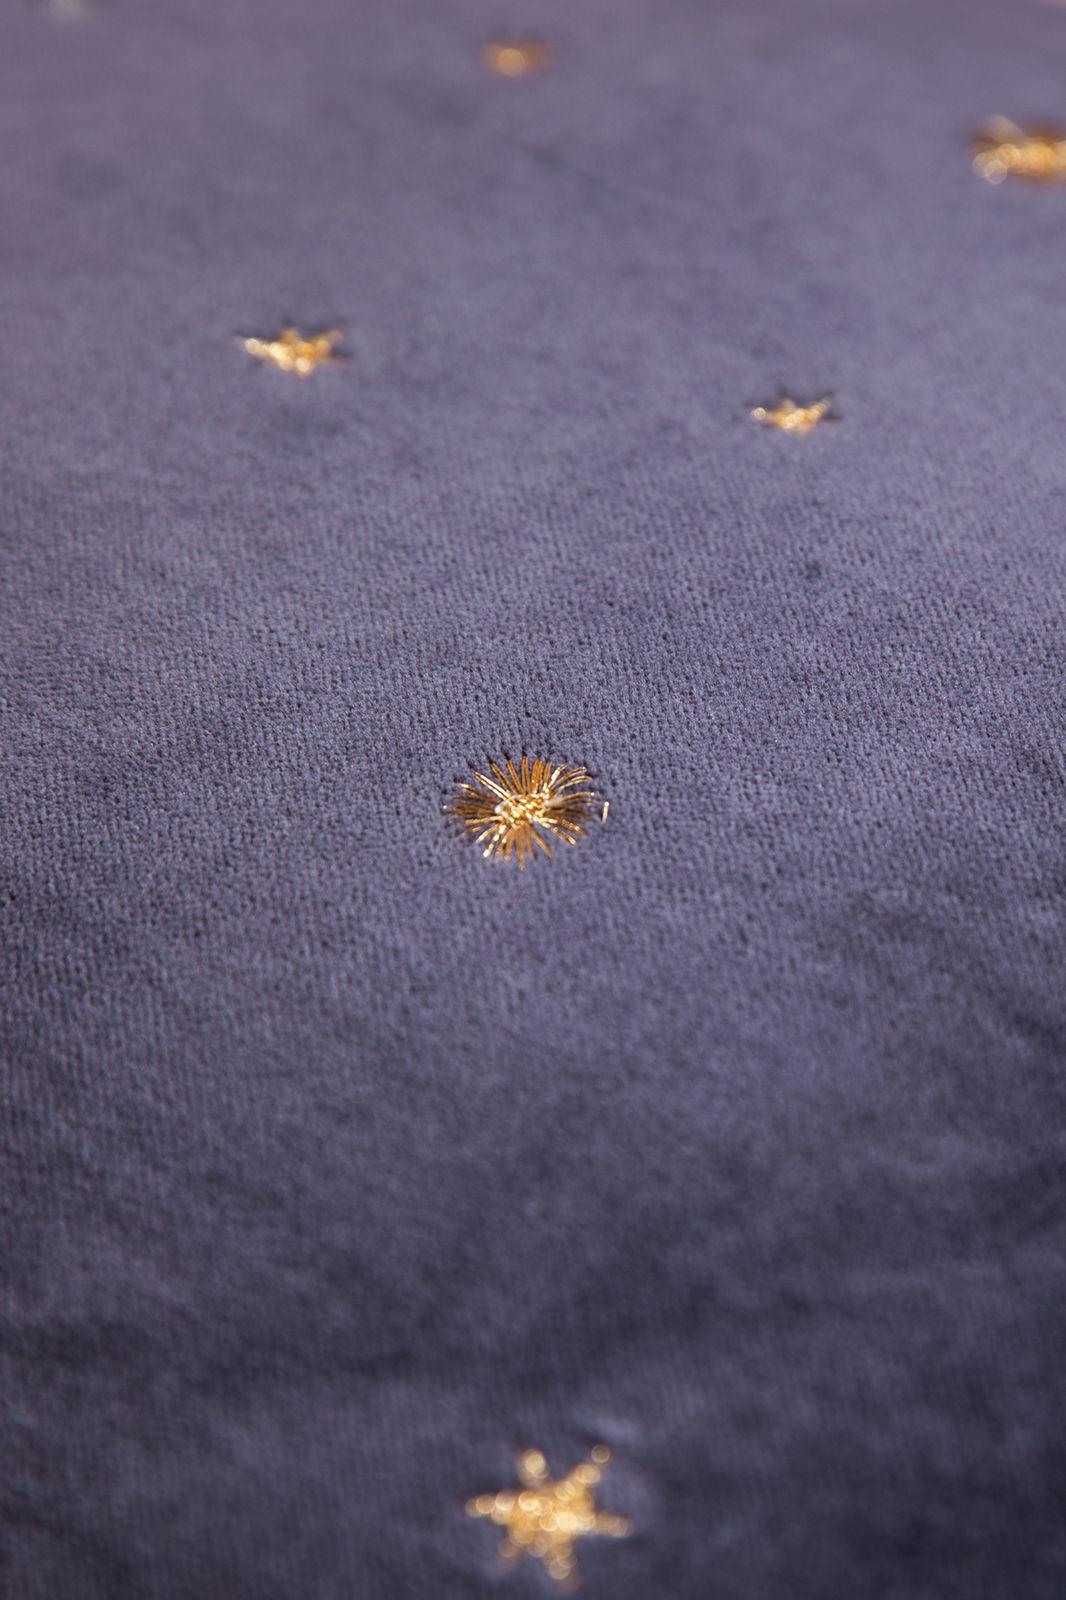 Donkerblauw sierkussen met ster embroidery - Homeland | Sissy-Boy